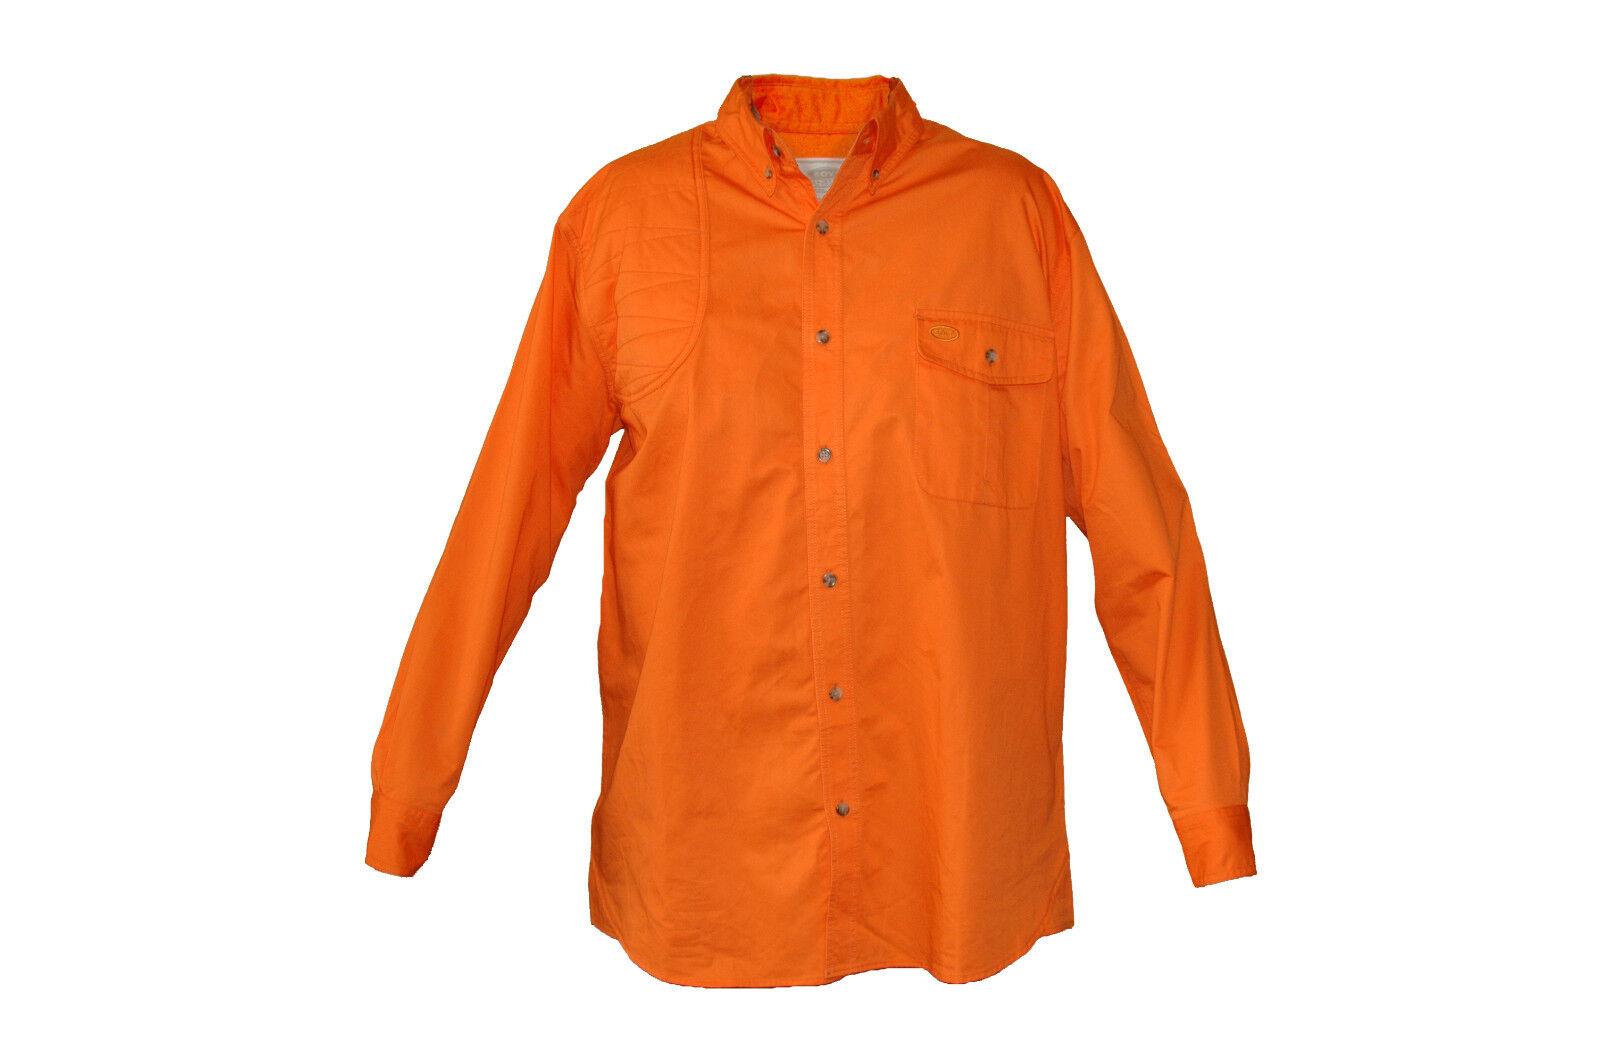 Boyt Harness LS Upland Scout Hunting Shirt Blaze Orange Big Game Upland Bird New